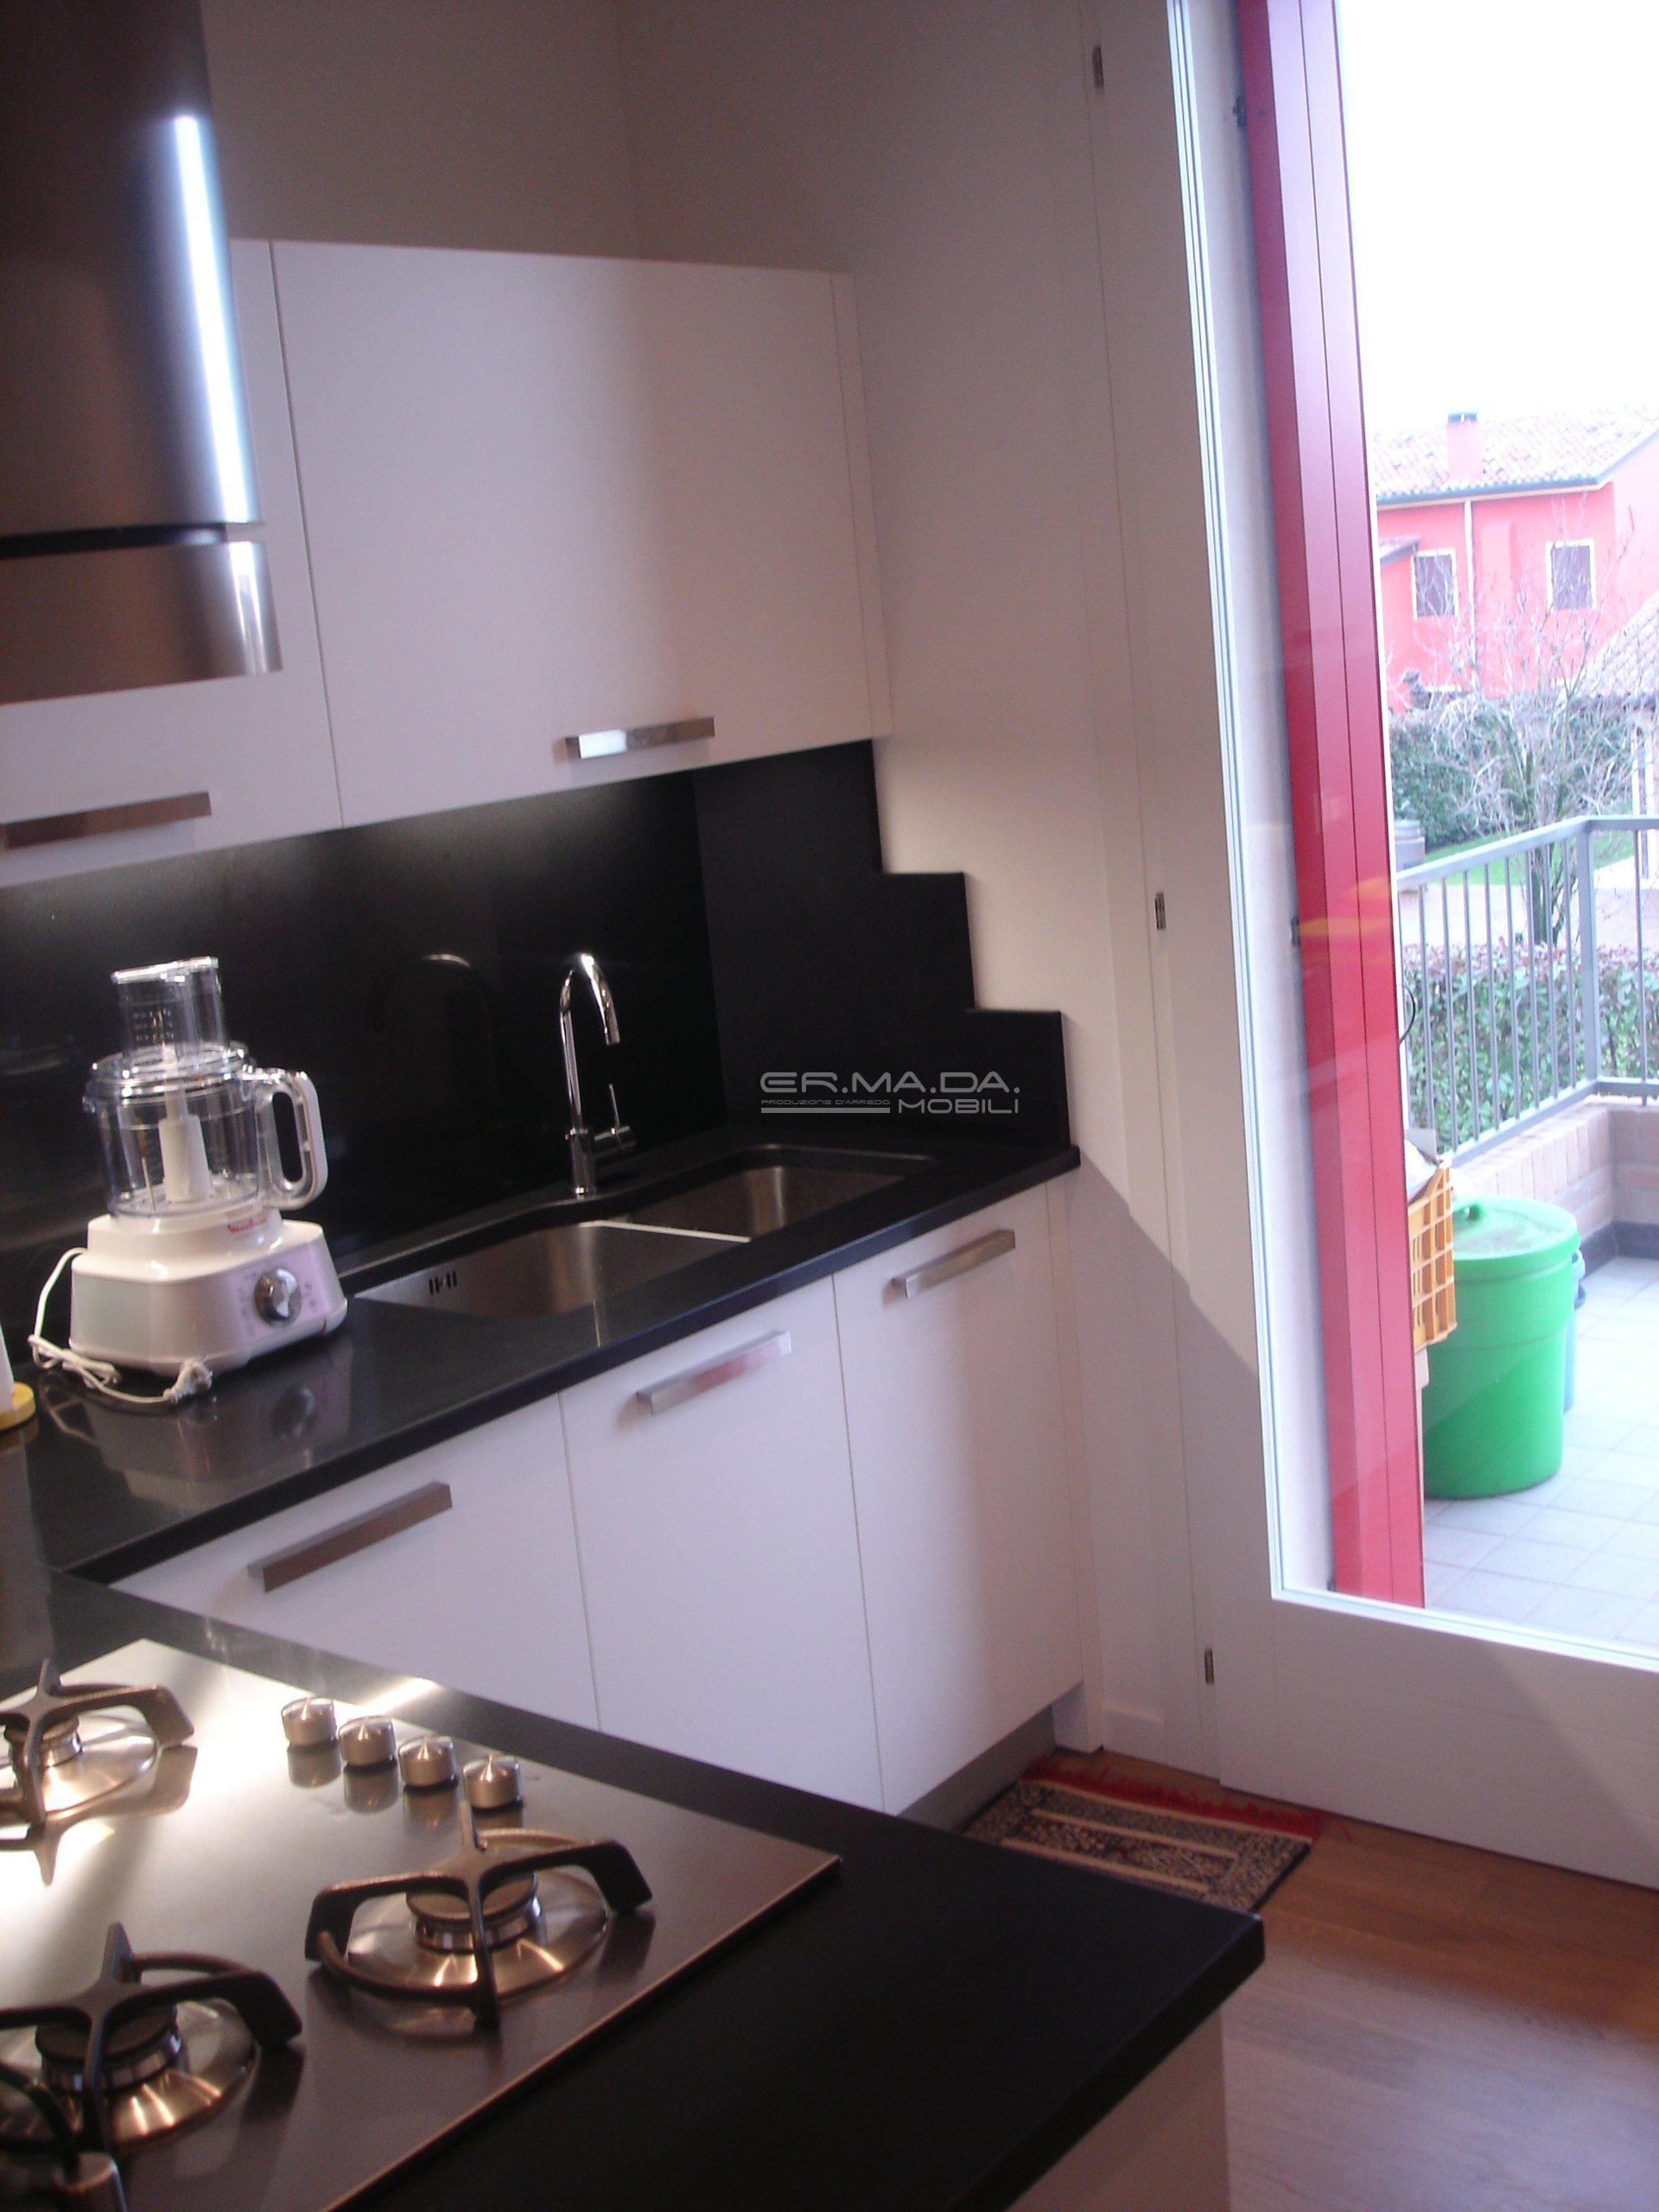 5 cucina moderna in bianco opaco er ma da mobilificio - Cucina bianco opaco ...